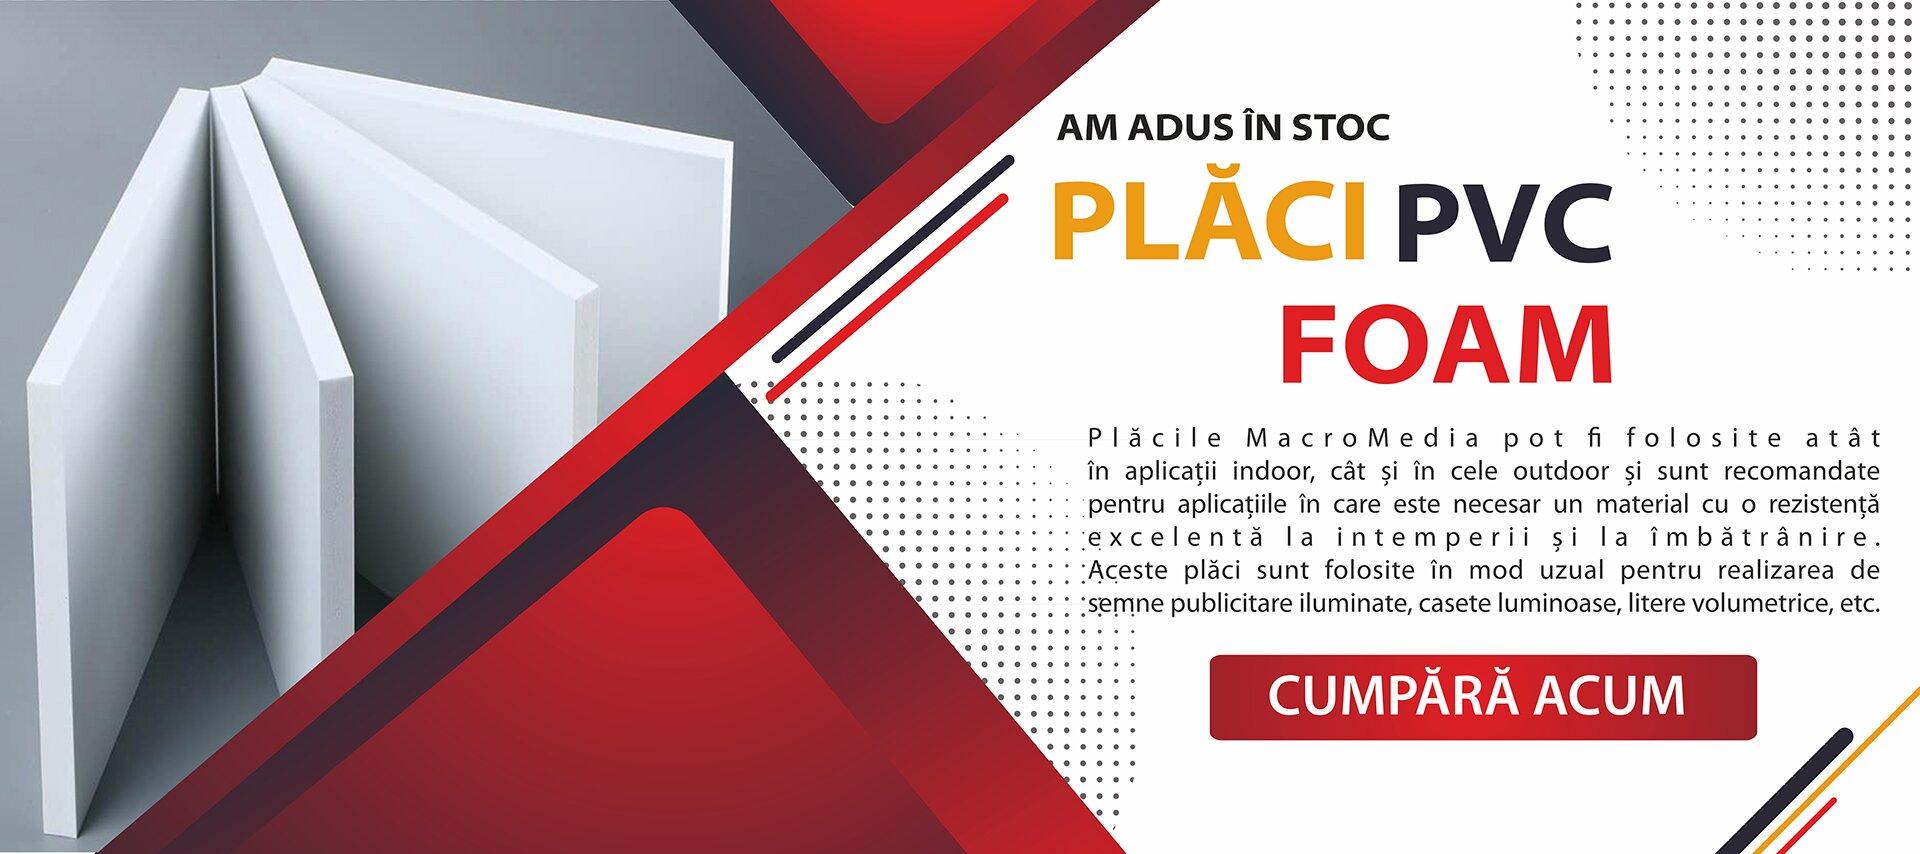 Placi PVC Foam